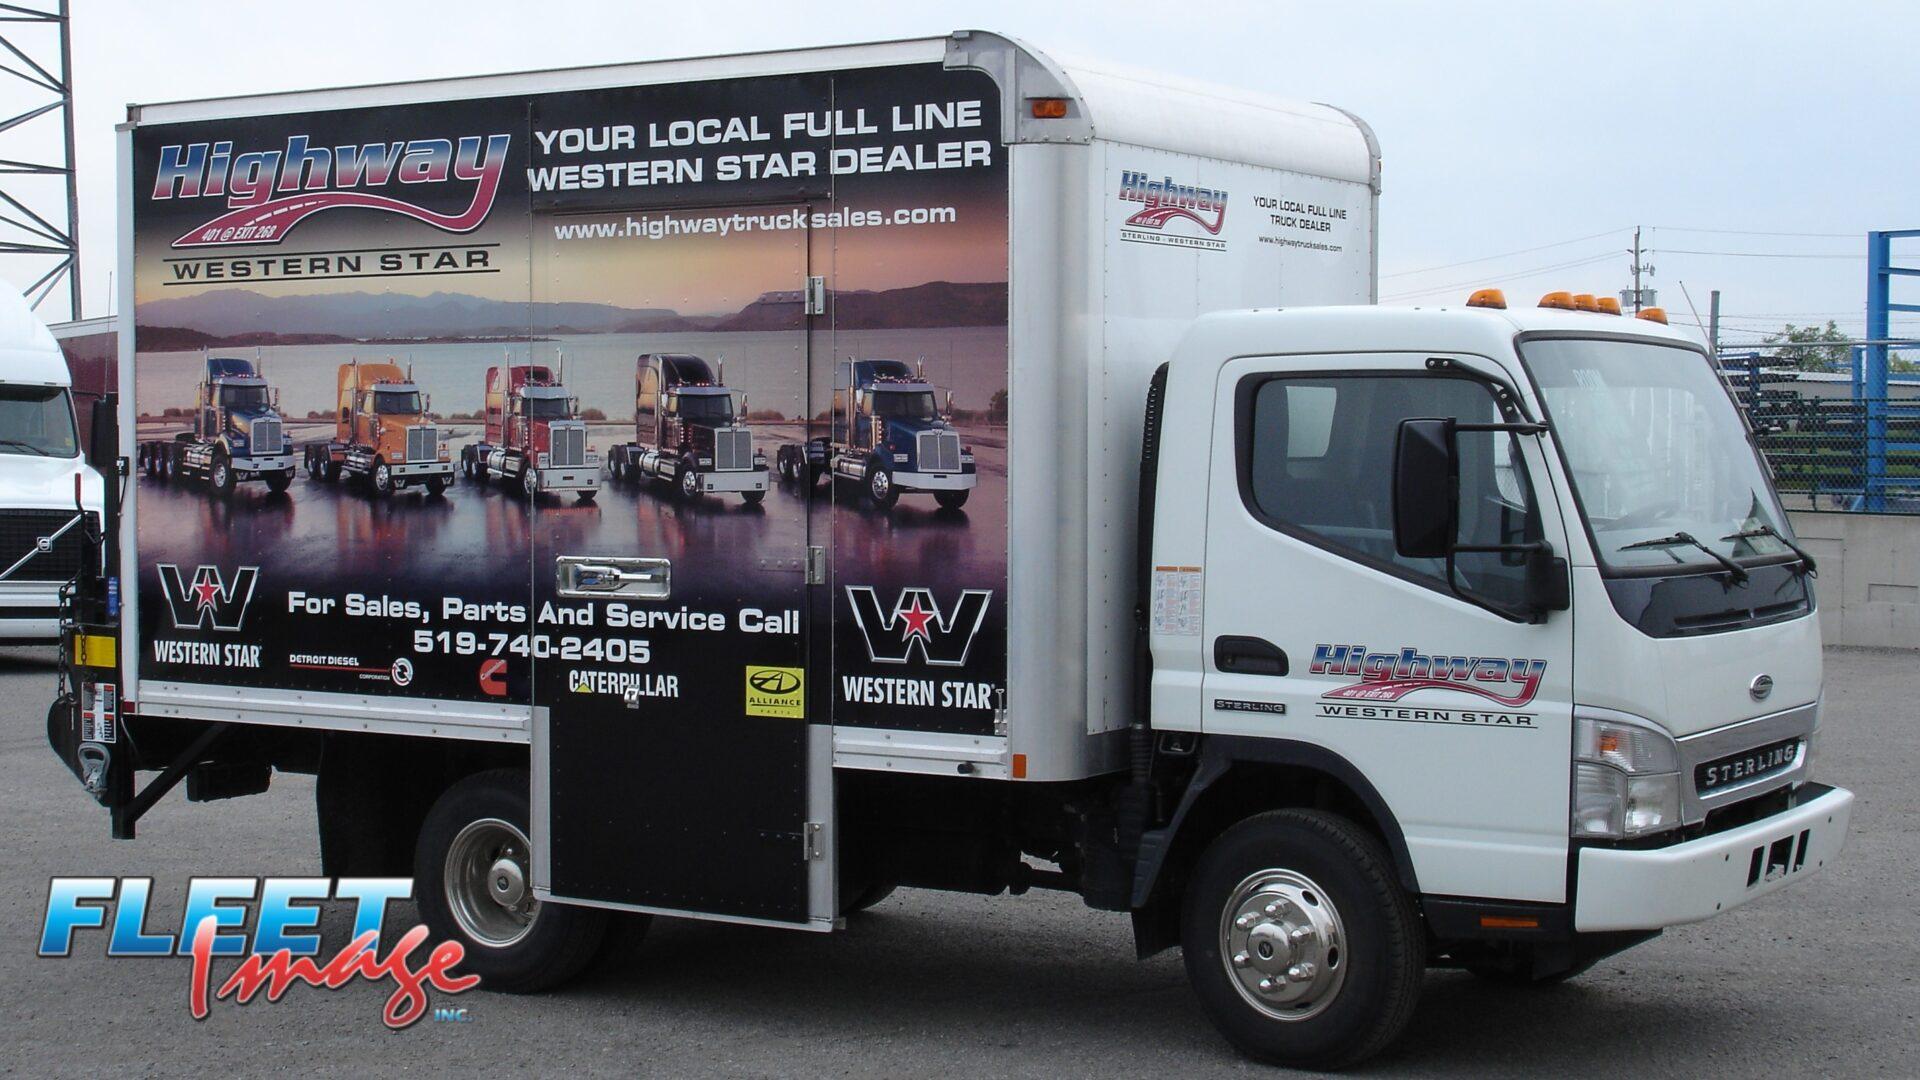 Western Star decal sticker on a truck